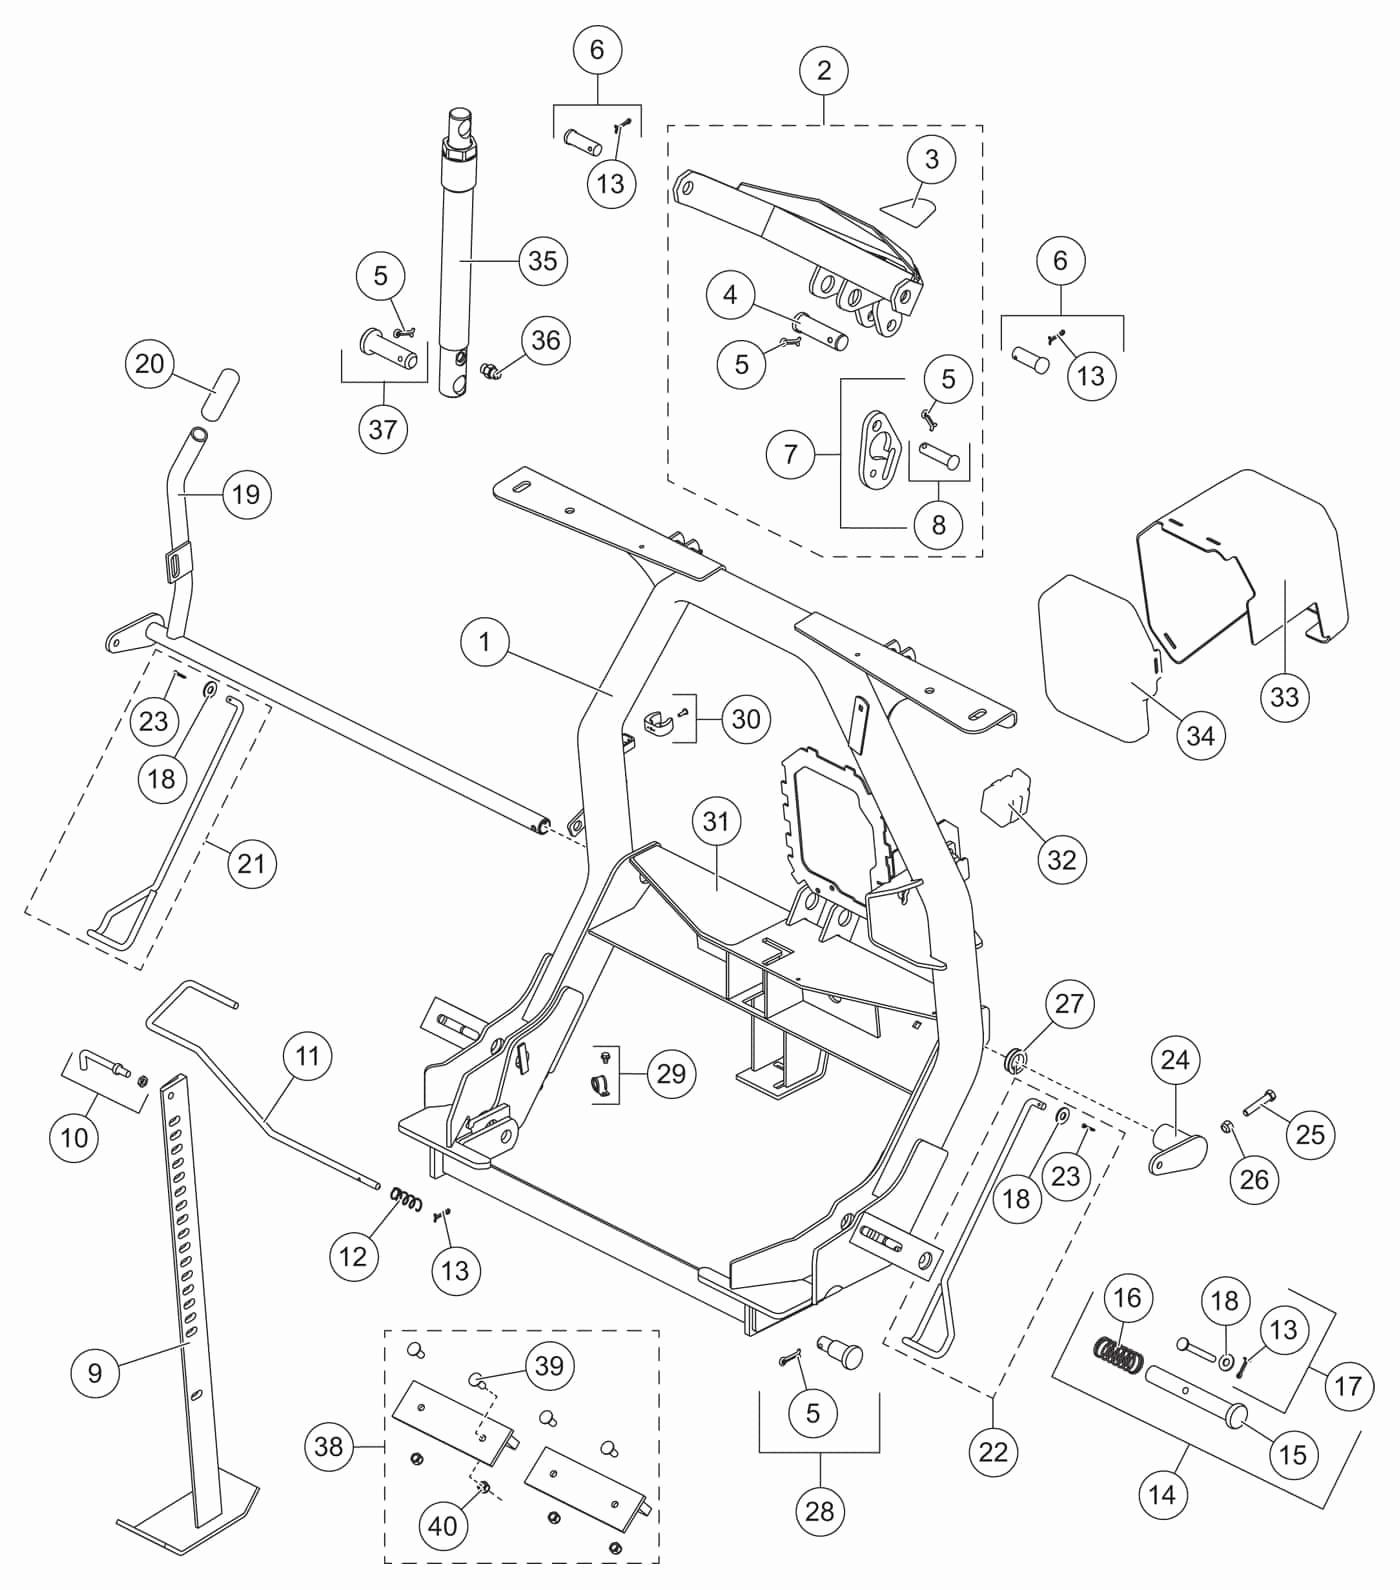 7 Inspirational Fisher Plow Wiring Diagram Minute Mount 2 Pics - Fisher Plow Wiring Diagram Minute Mount 2